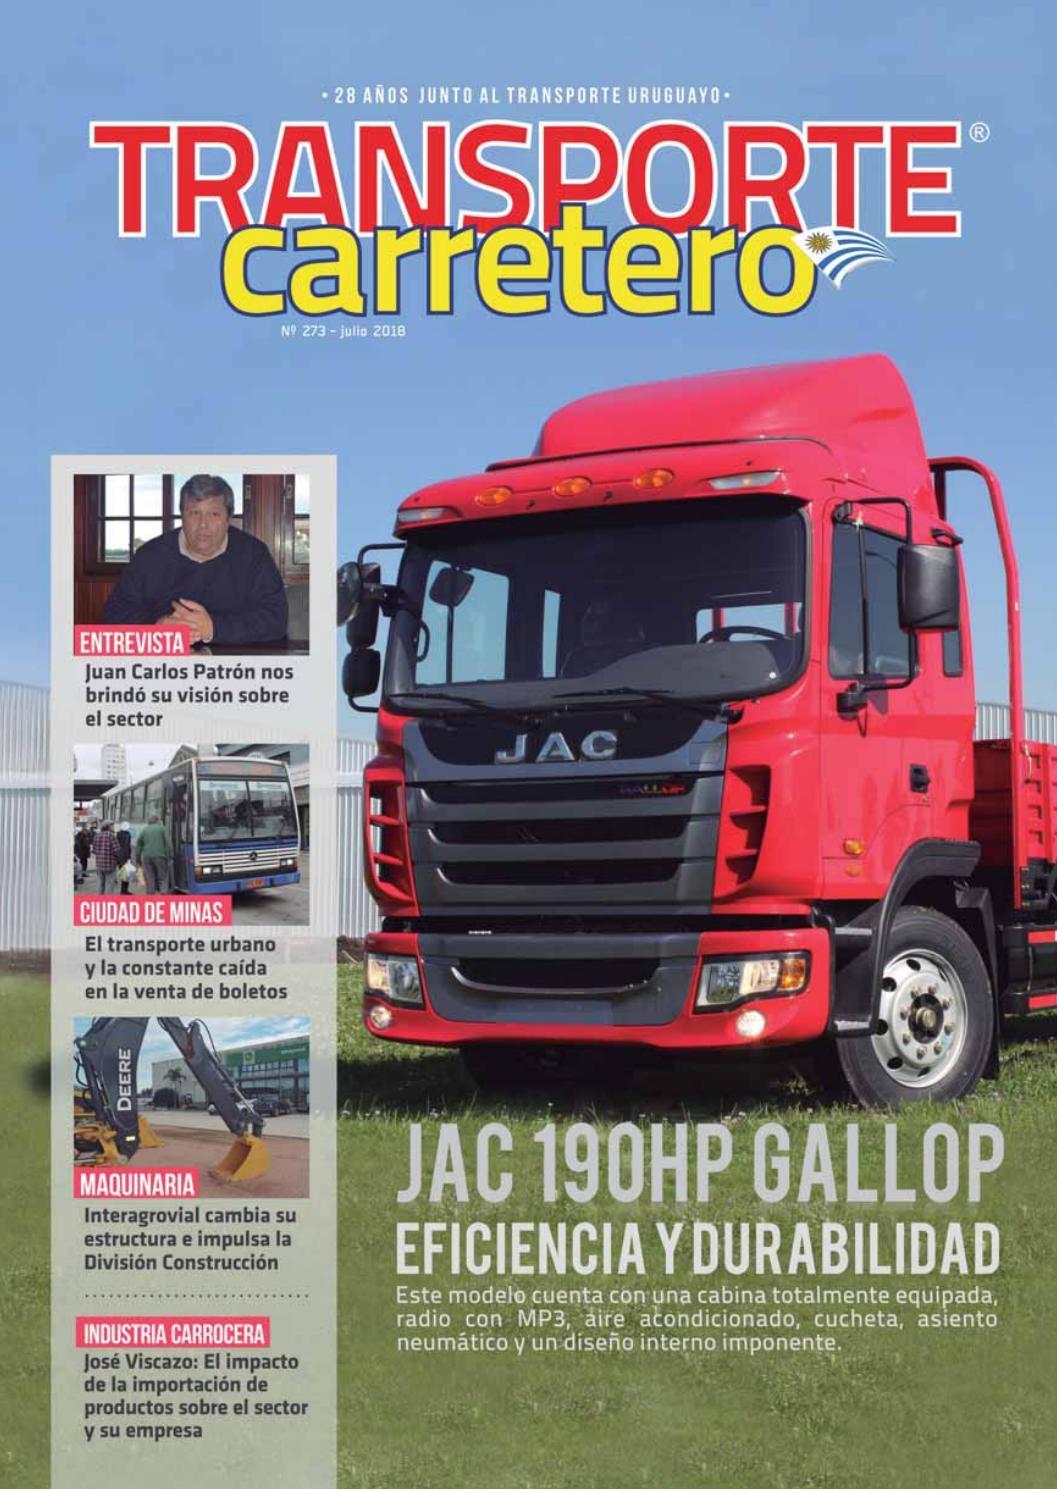 Transporte Carretero Nº 273 Julio 2018 by Diseño Producciones - issuu bd8a83ae736